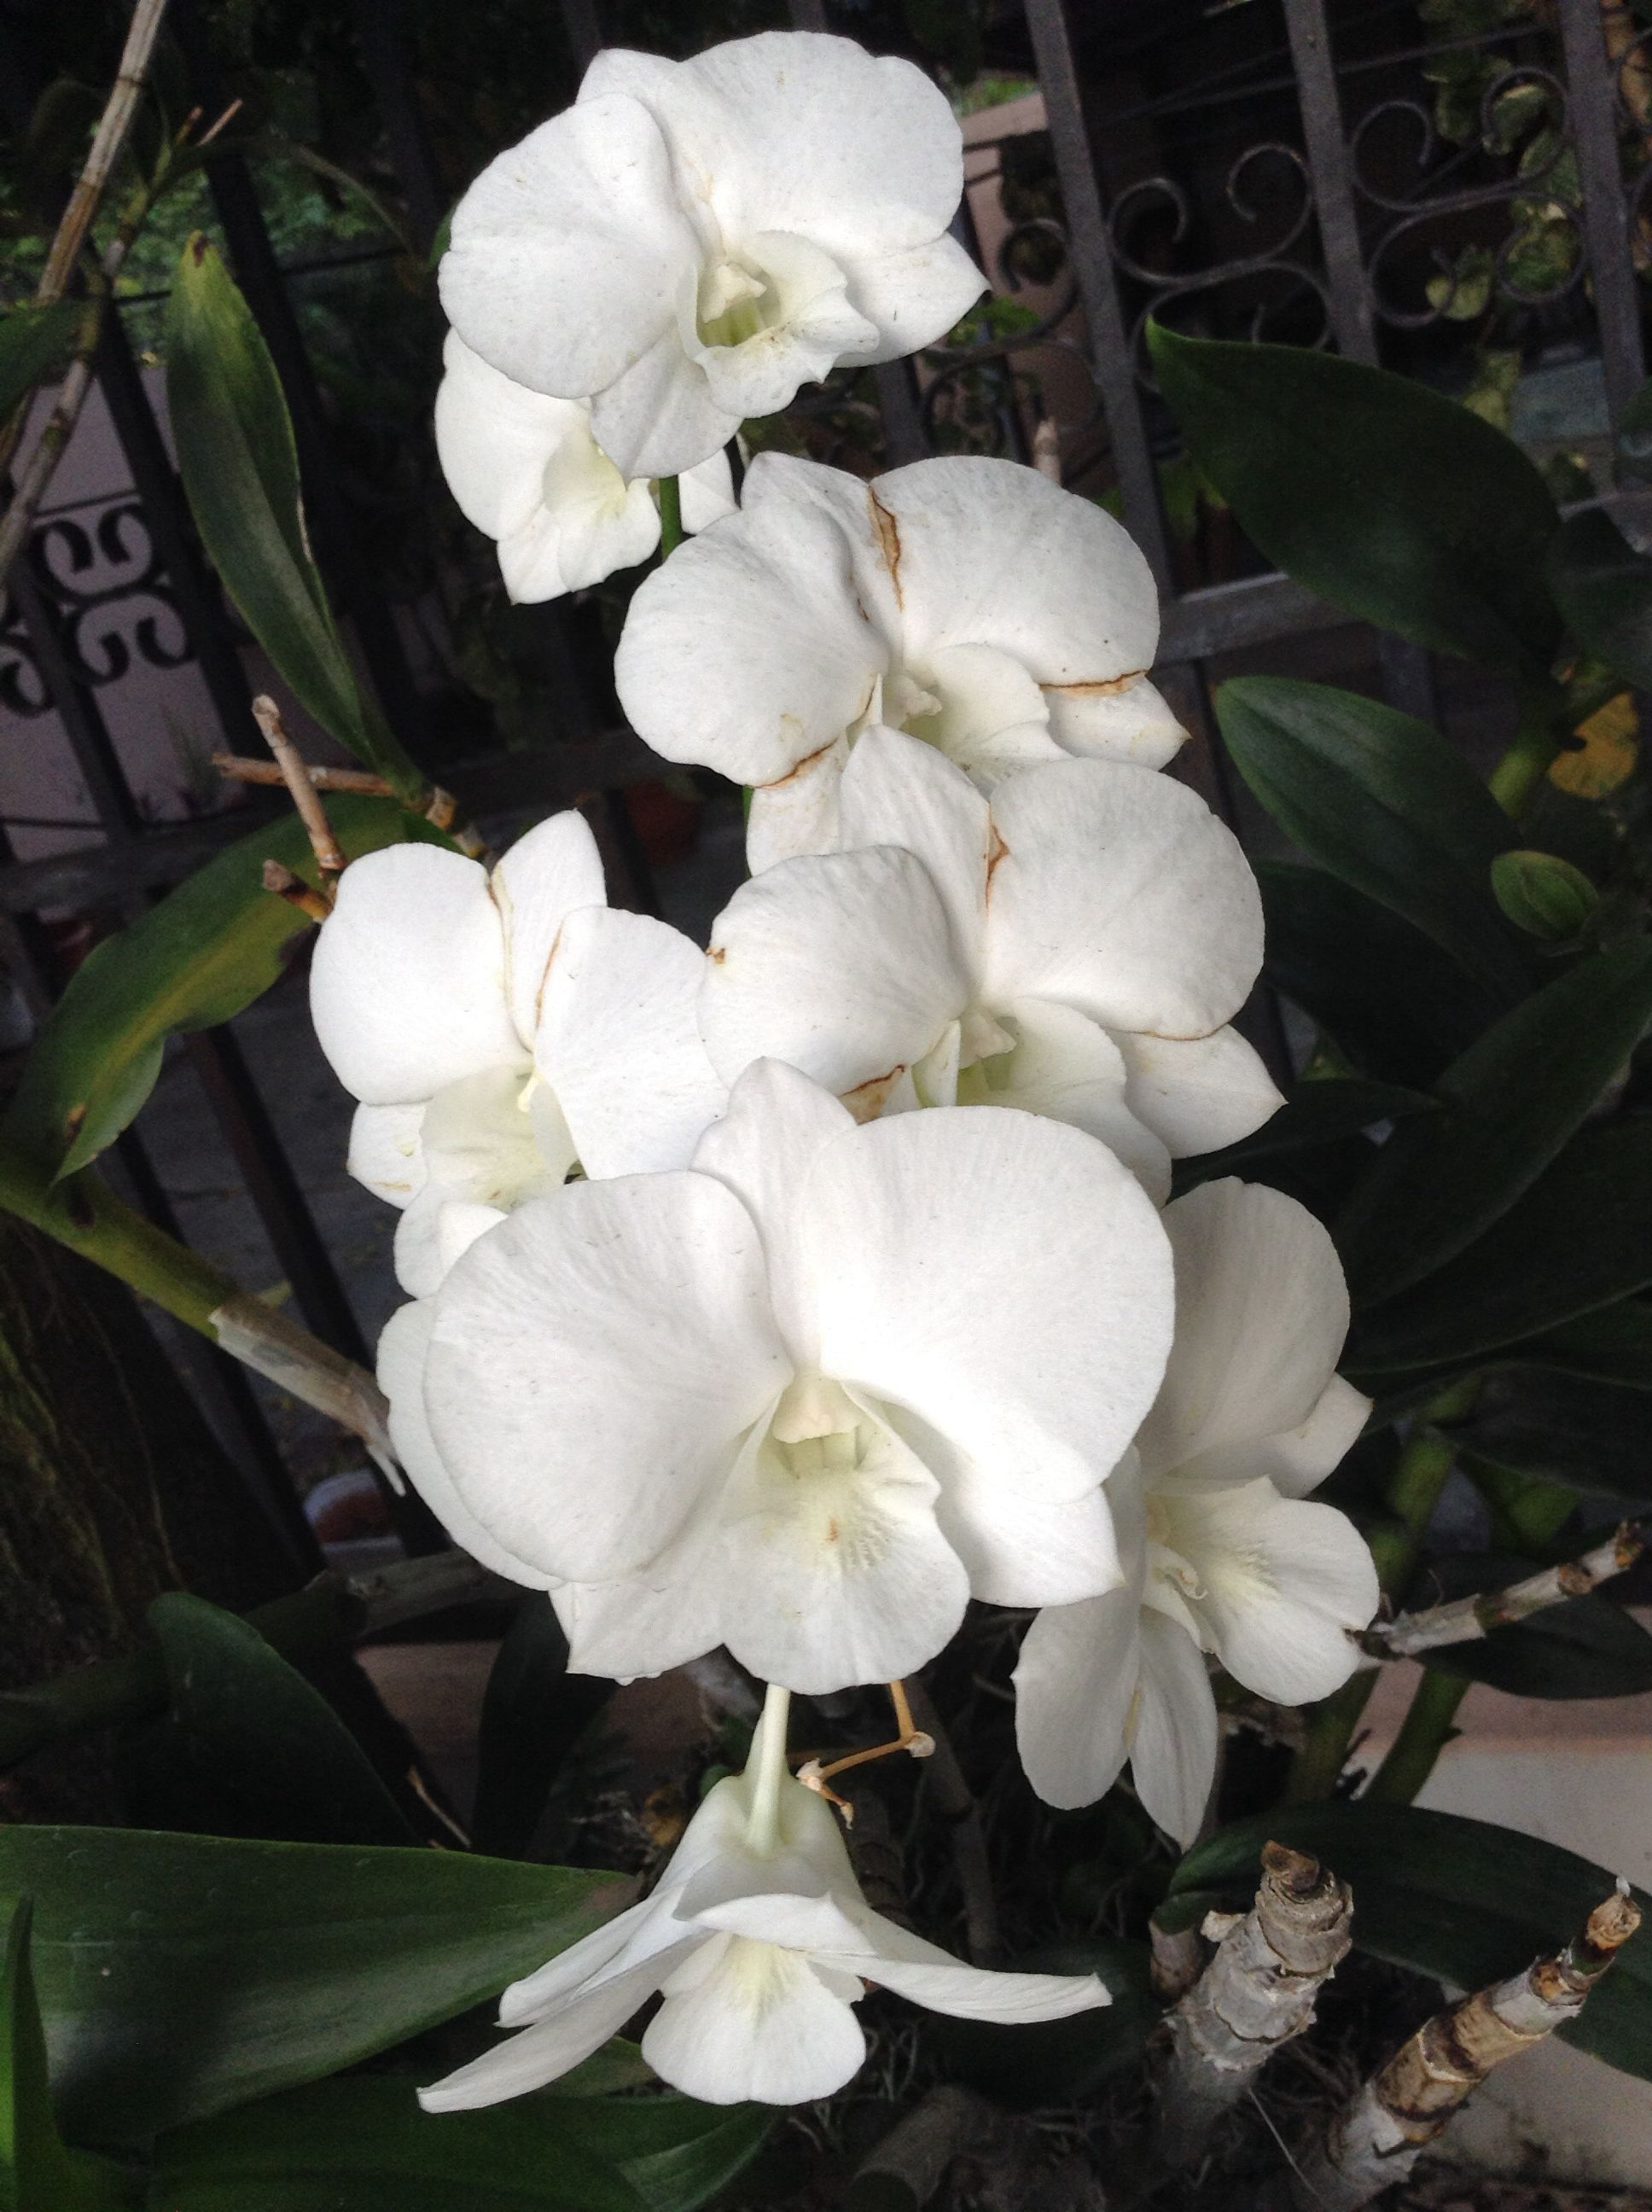 Orquideas orquideas de mi jardín pinterest flowers and plants